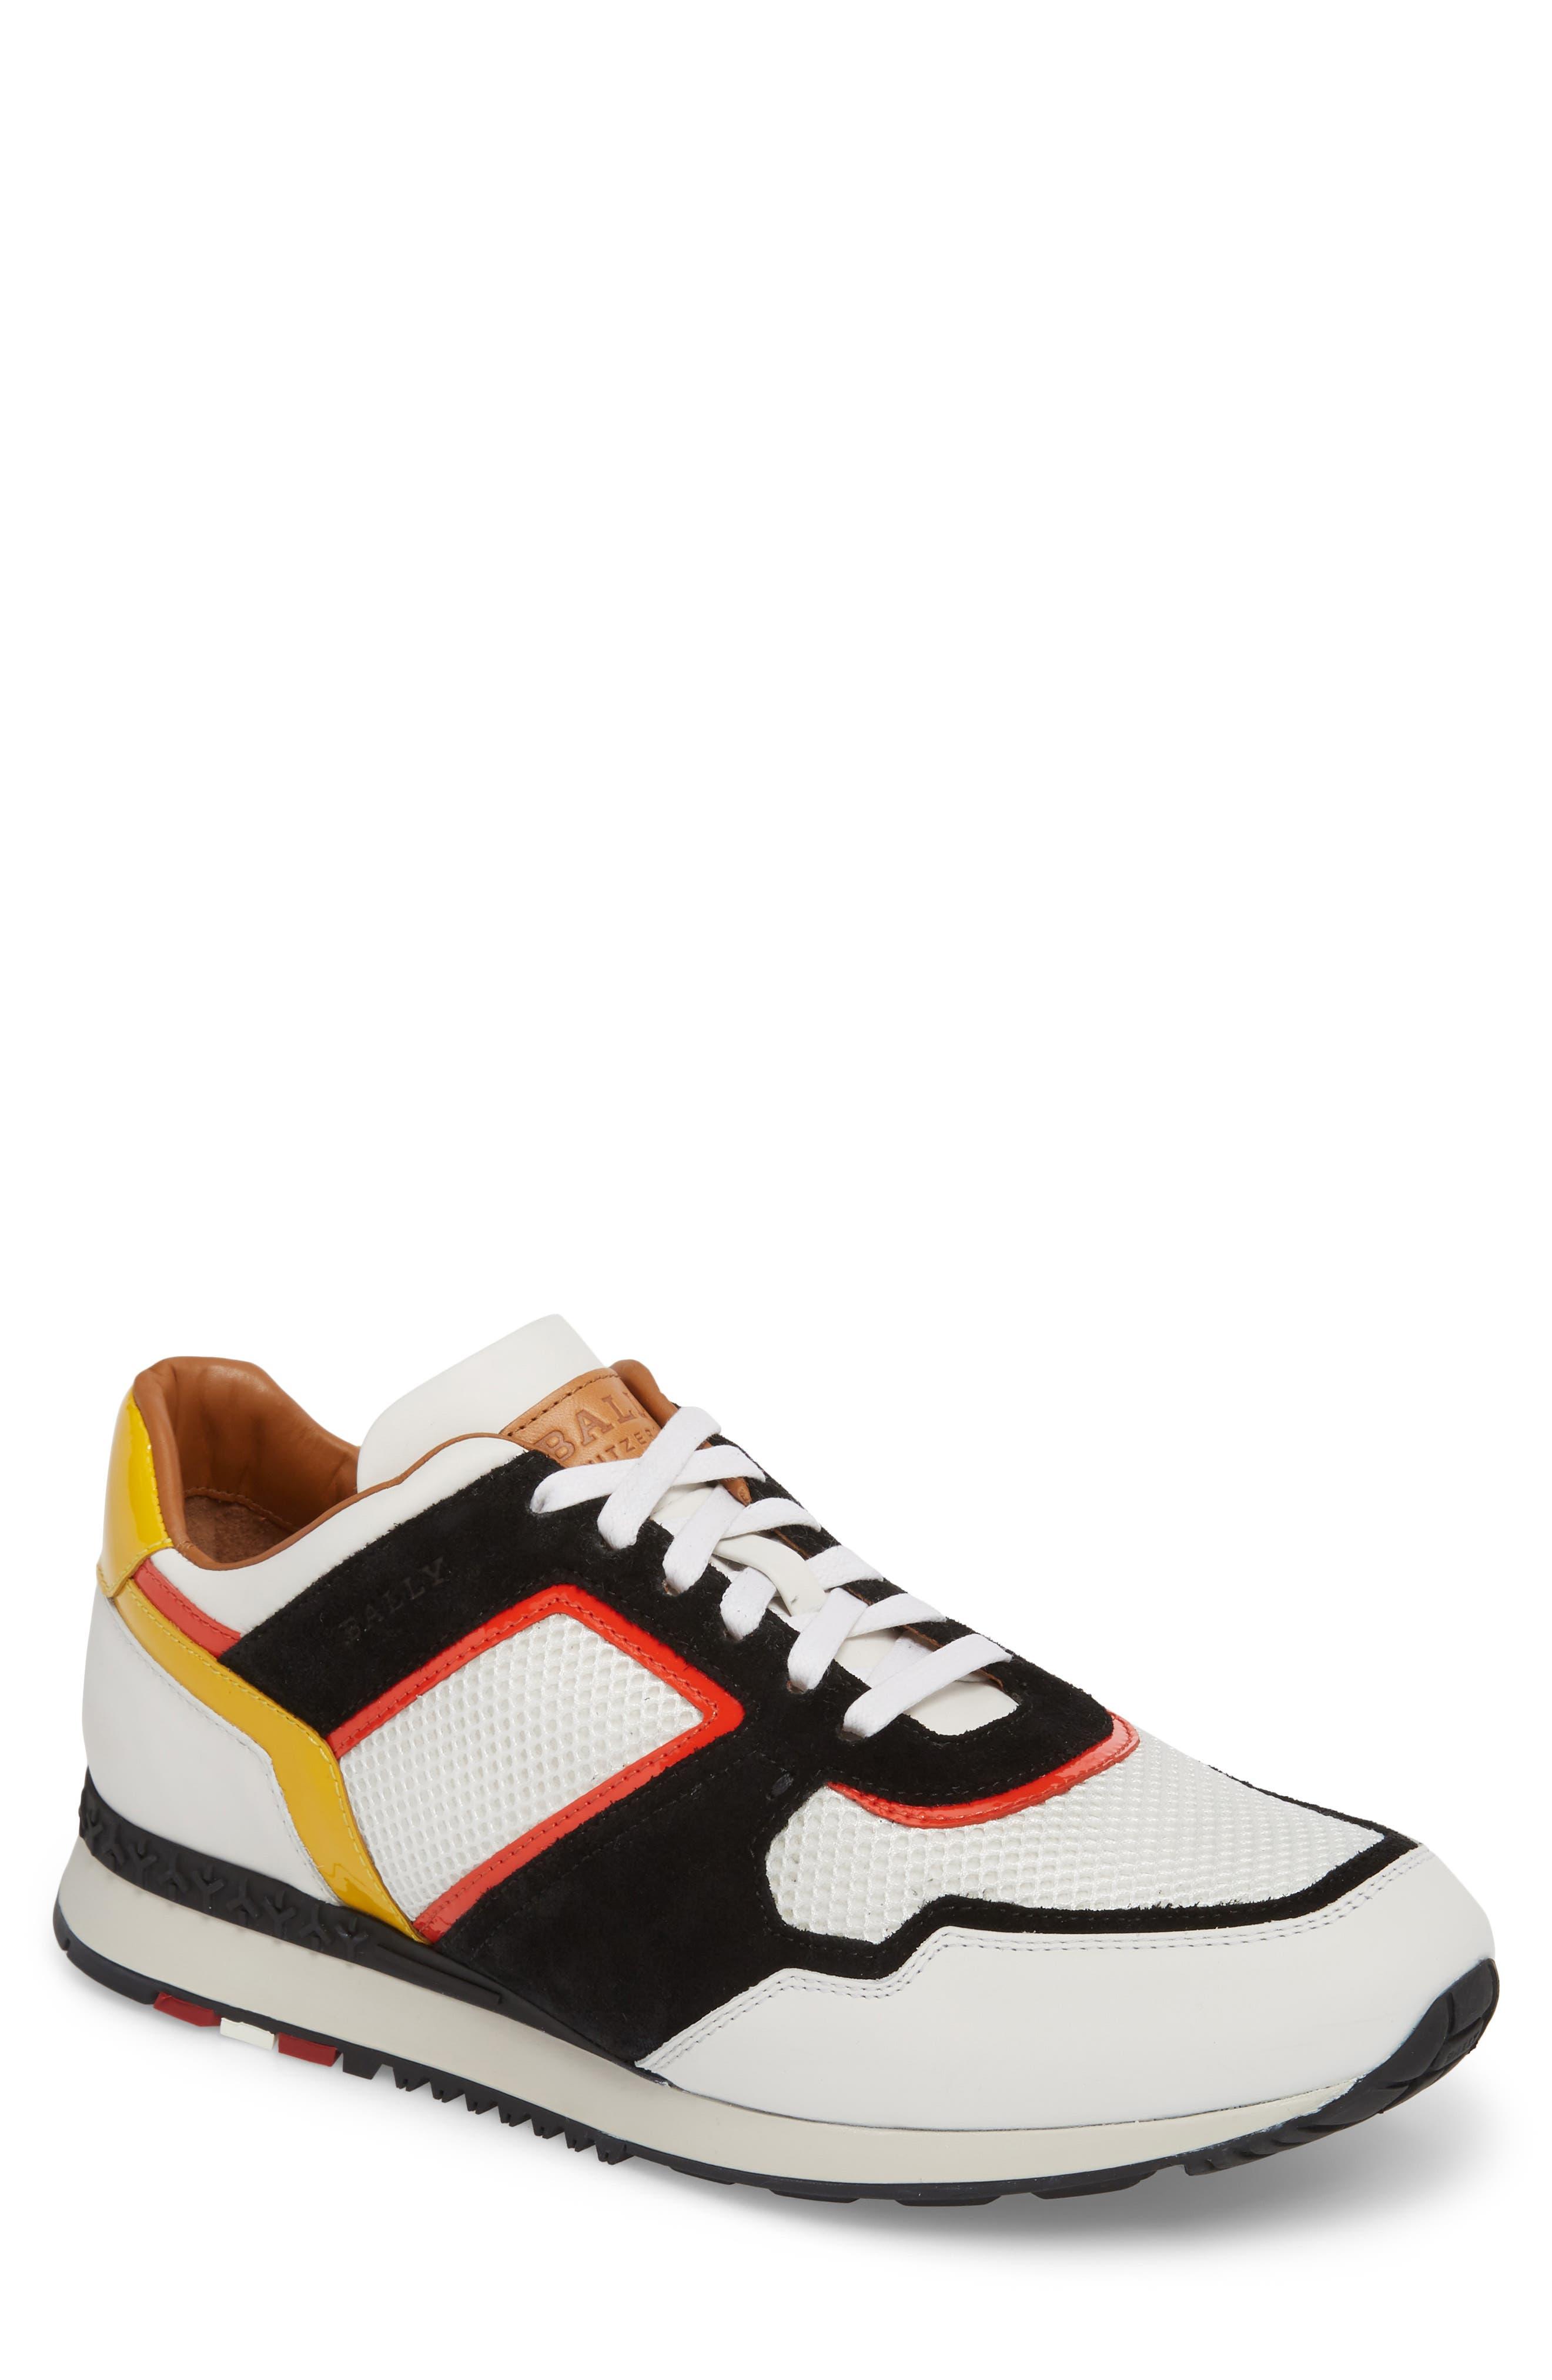 Bally Astreo Low Top Sneaker (Men)